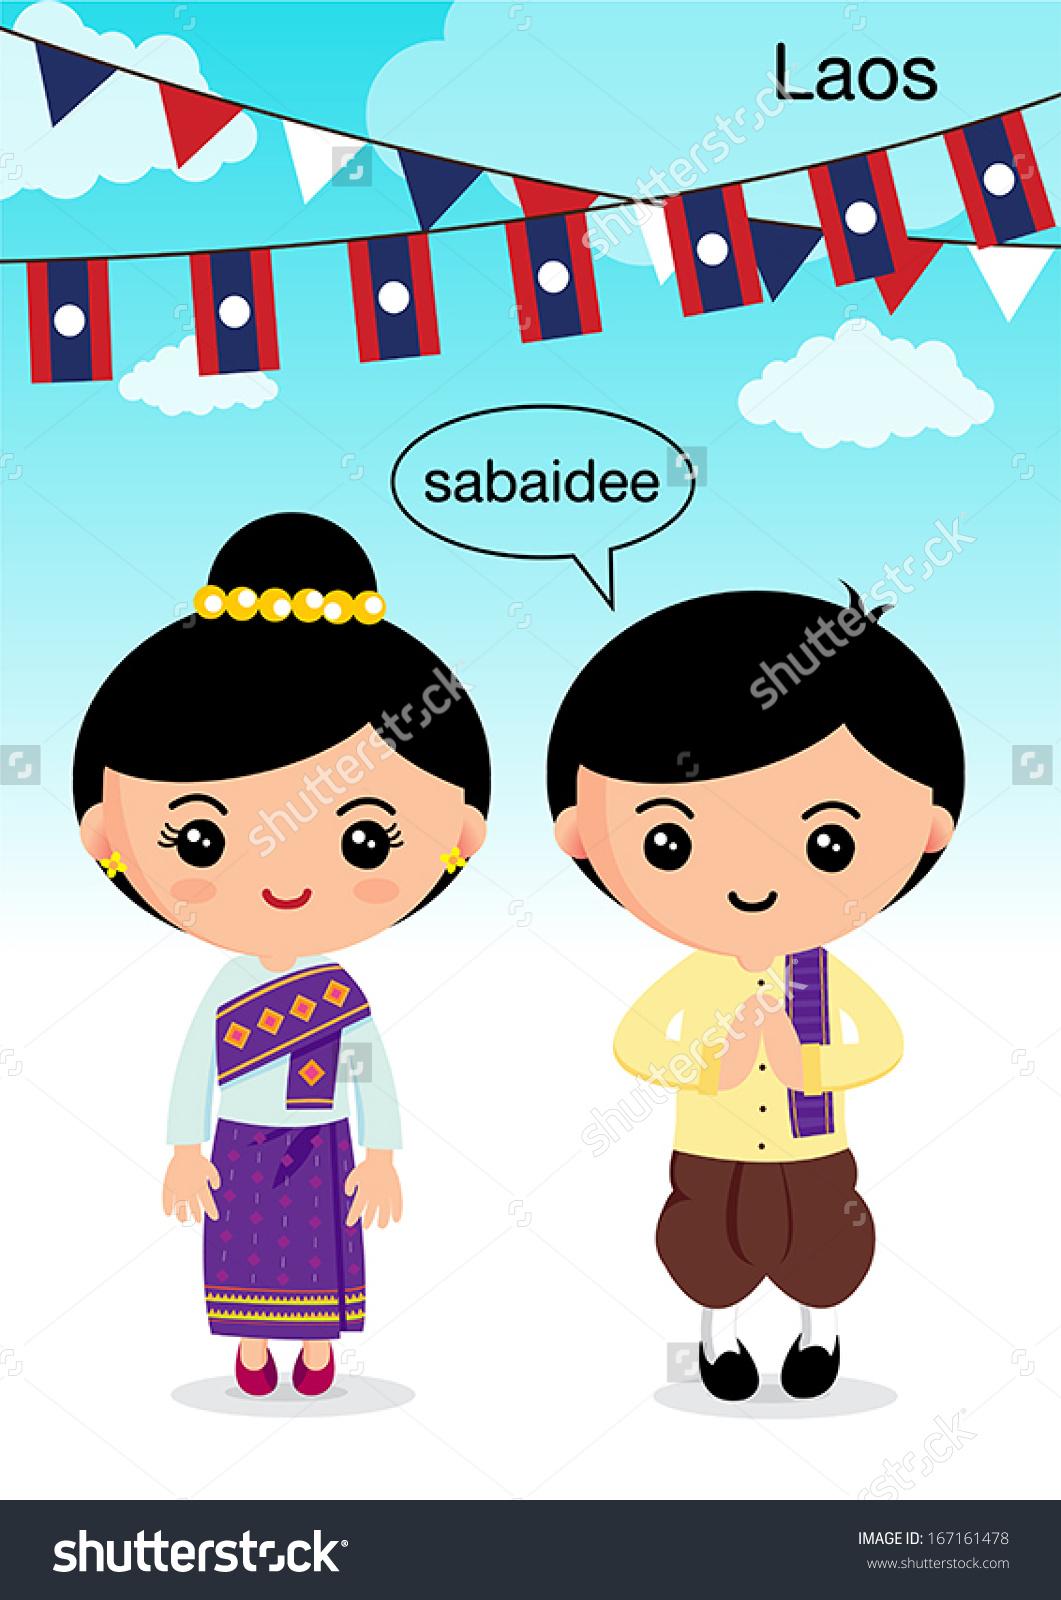 Laos Traditional Costume Asia Asean Stock Vector 167161478.